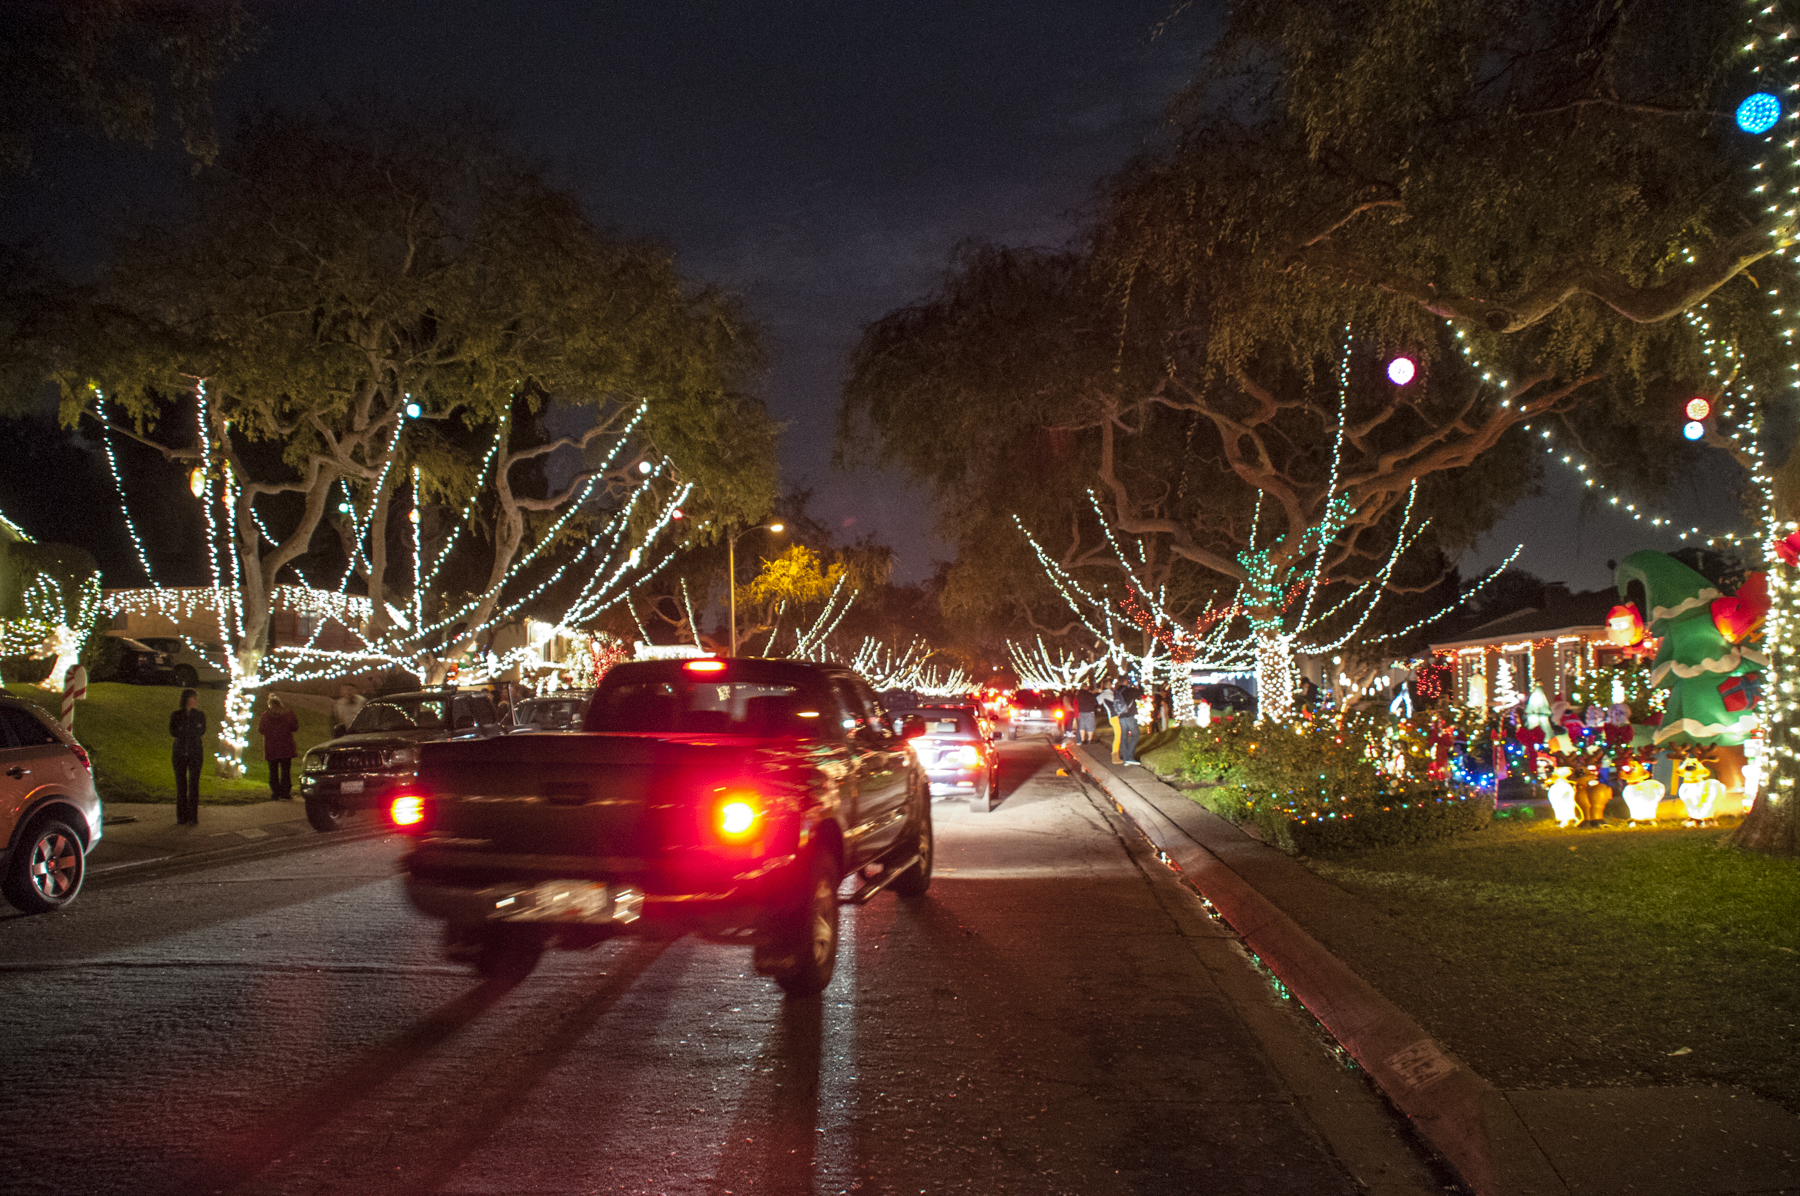 Sleepy Hollow Christmas Lights Extravaganza